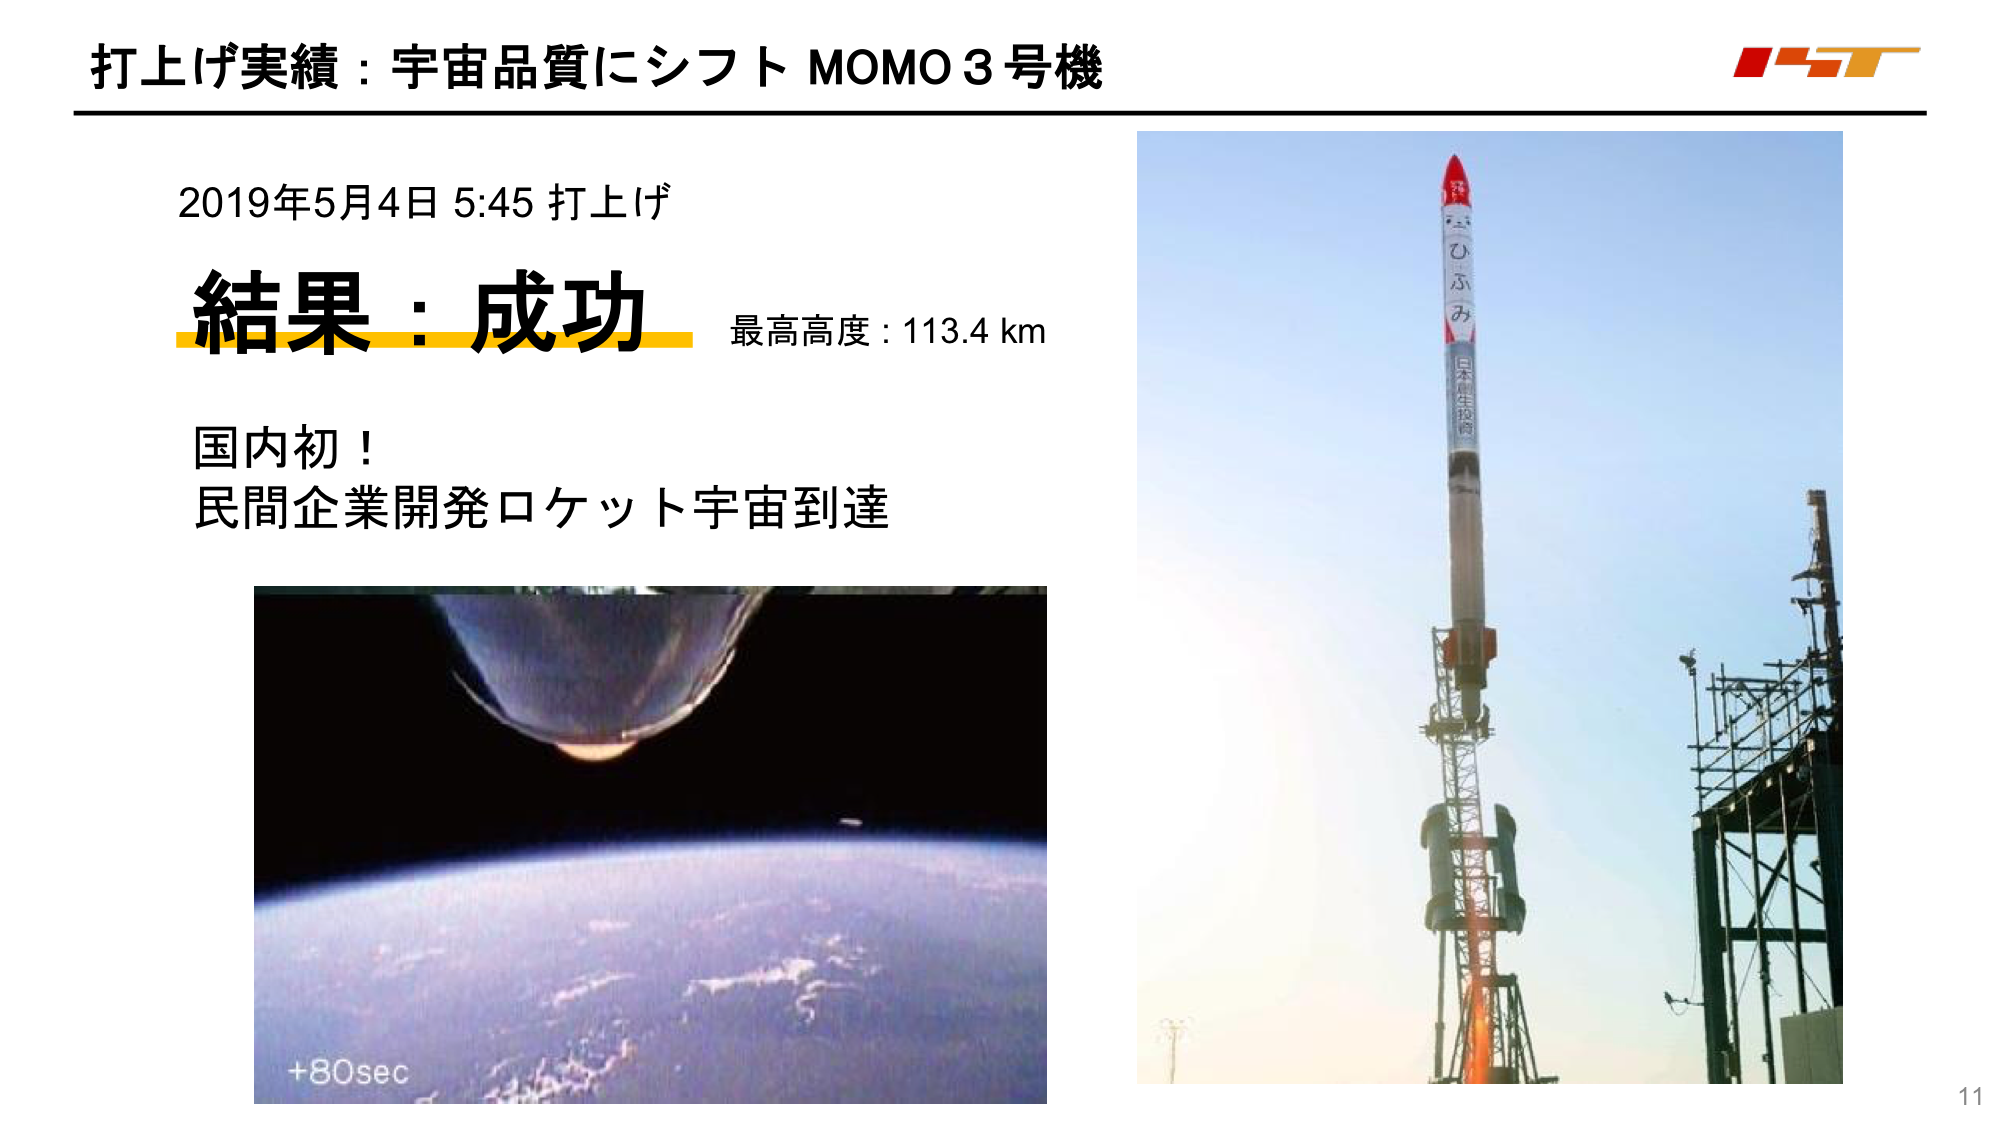 f:id:Imamura:20191126135103p:plain